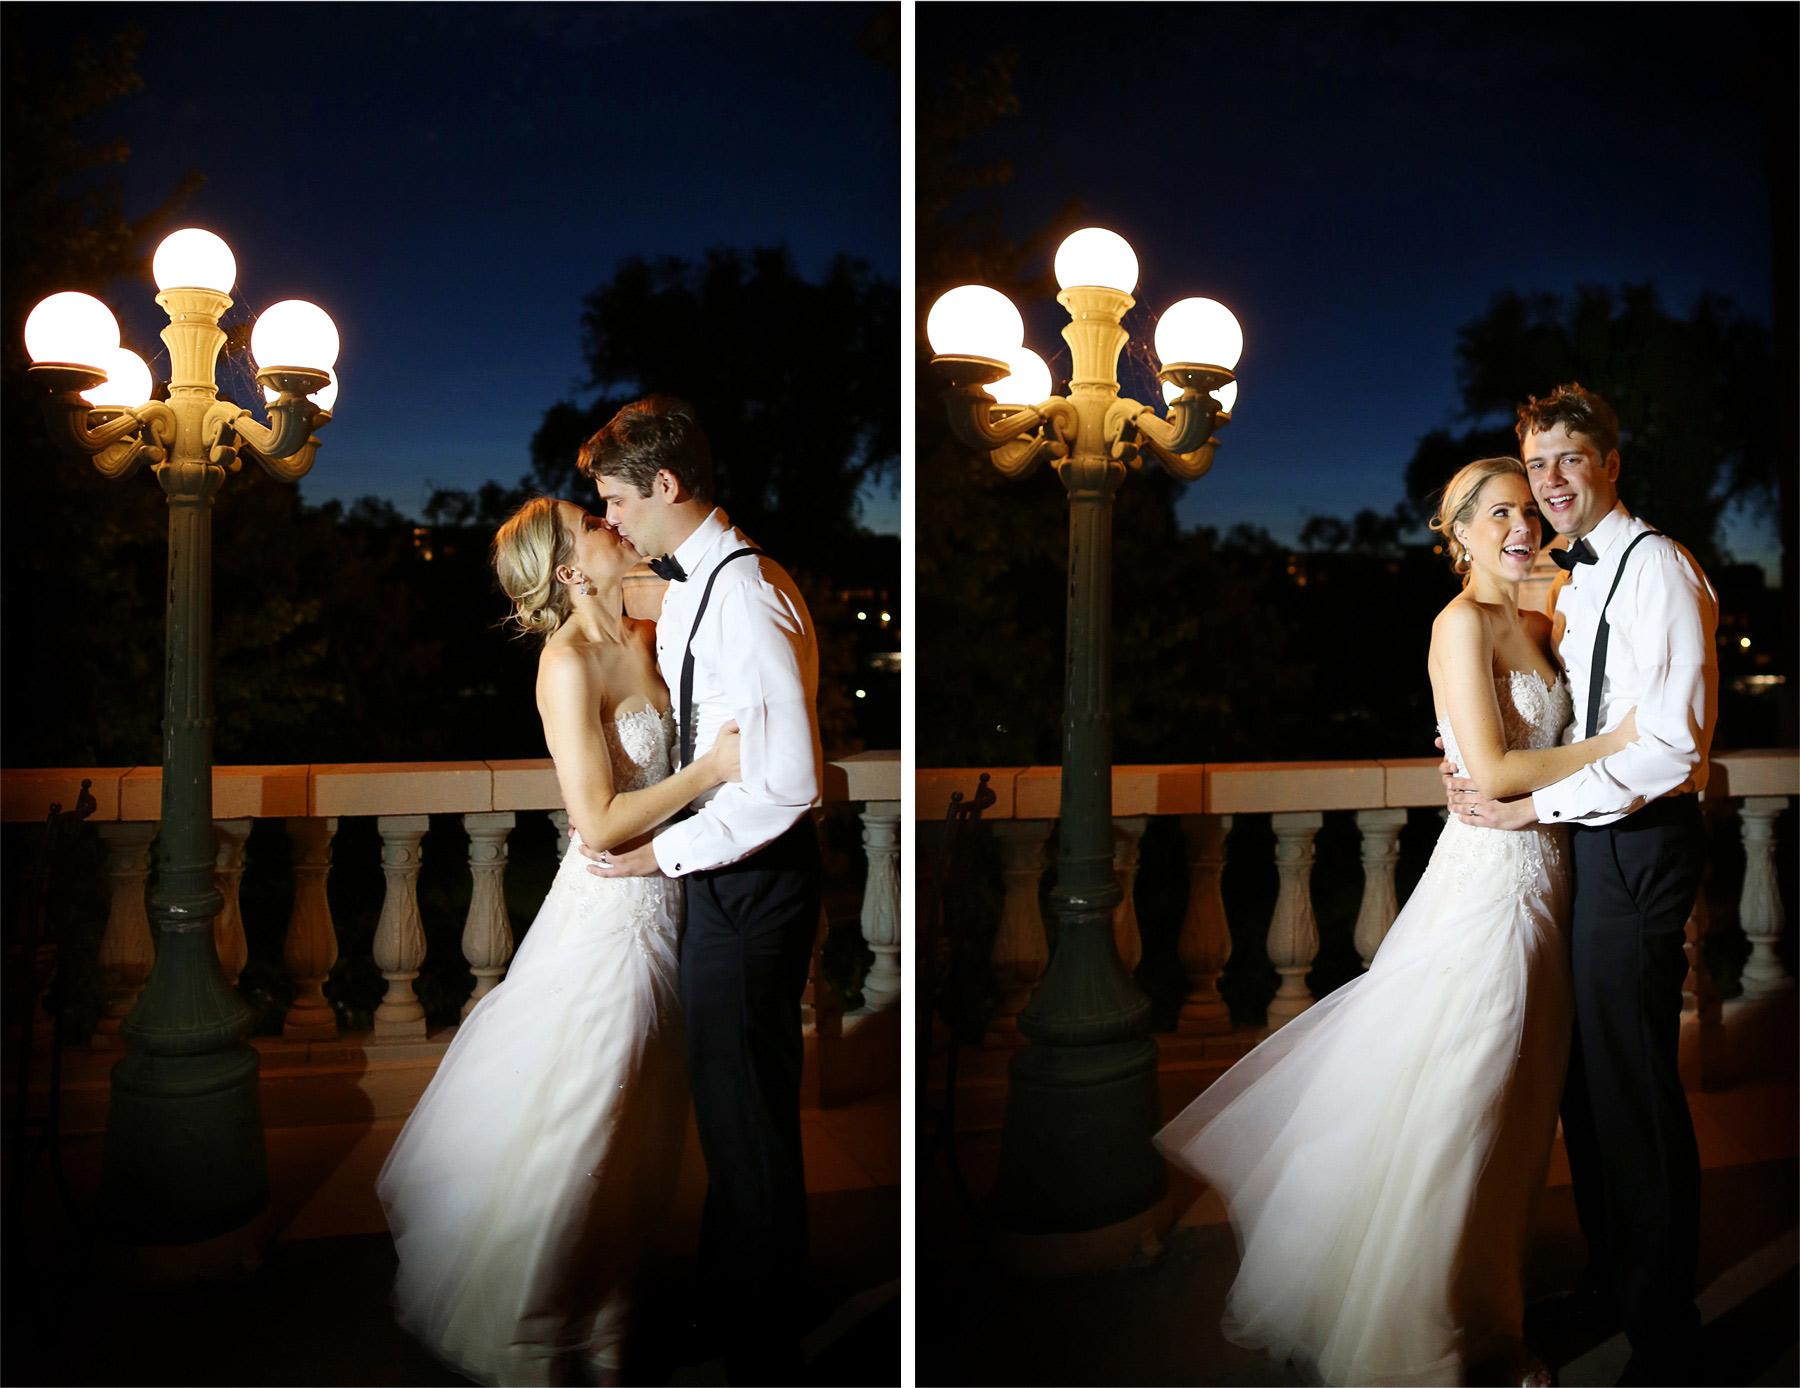 26-Minneapolis-Minnesota-Wedding-Photographer-by-Andrew-Vick-Photography-Summer--Calhoun-Beach-Club-Reception-Bride-Groom-Kiss-Embrace-Night-Terrace-Michelle-and-Kevin.jpg